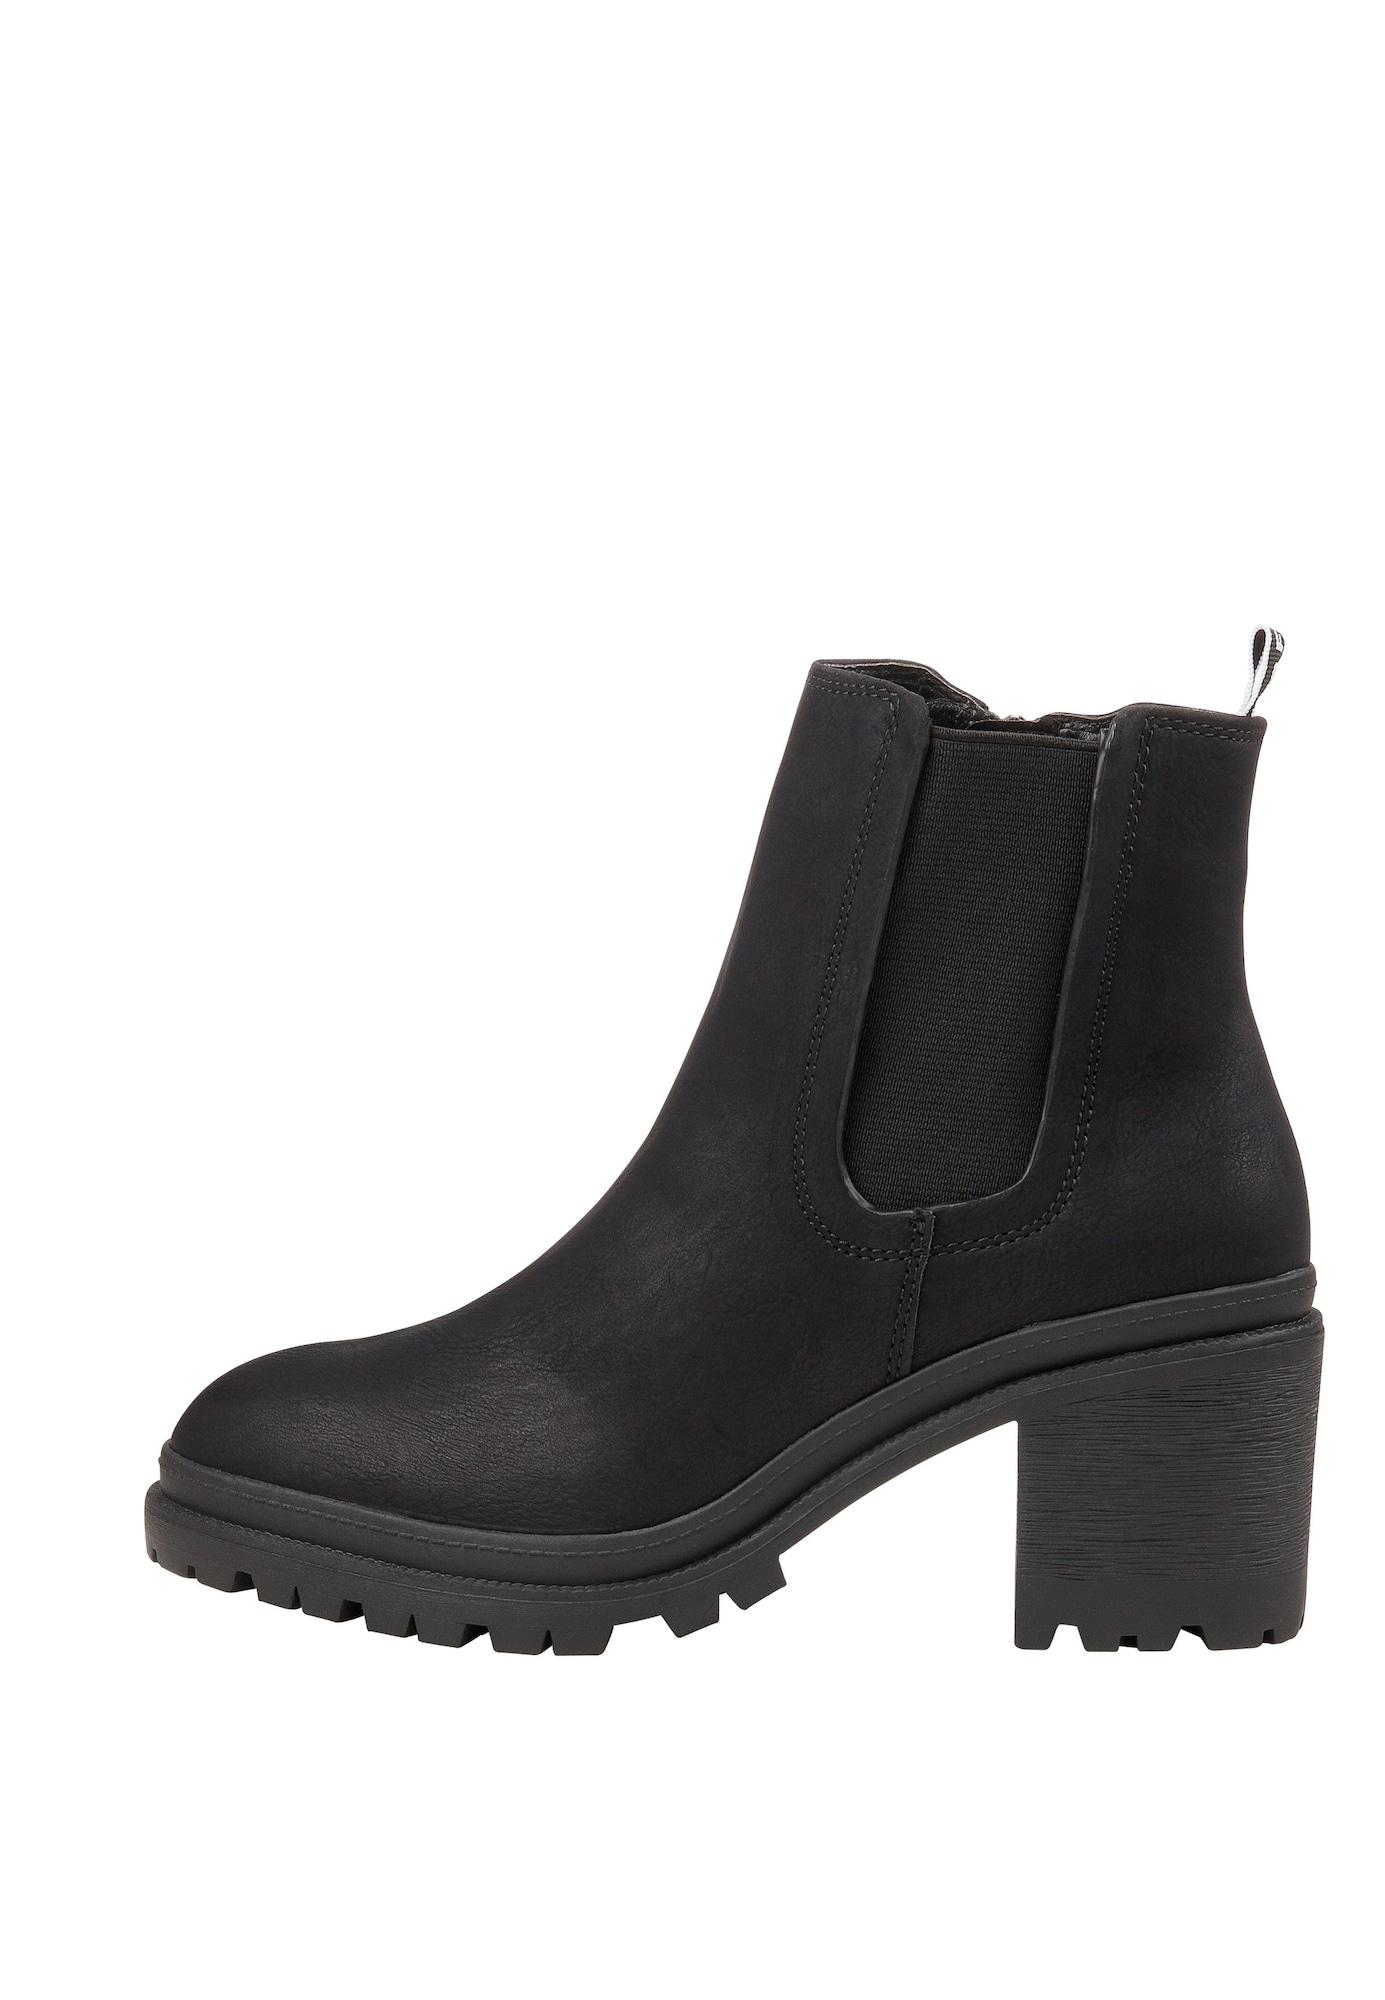 High-Heel-Stiefelette 'Masa'   Schuhe > High Heels   Fritzi Aus Preußen